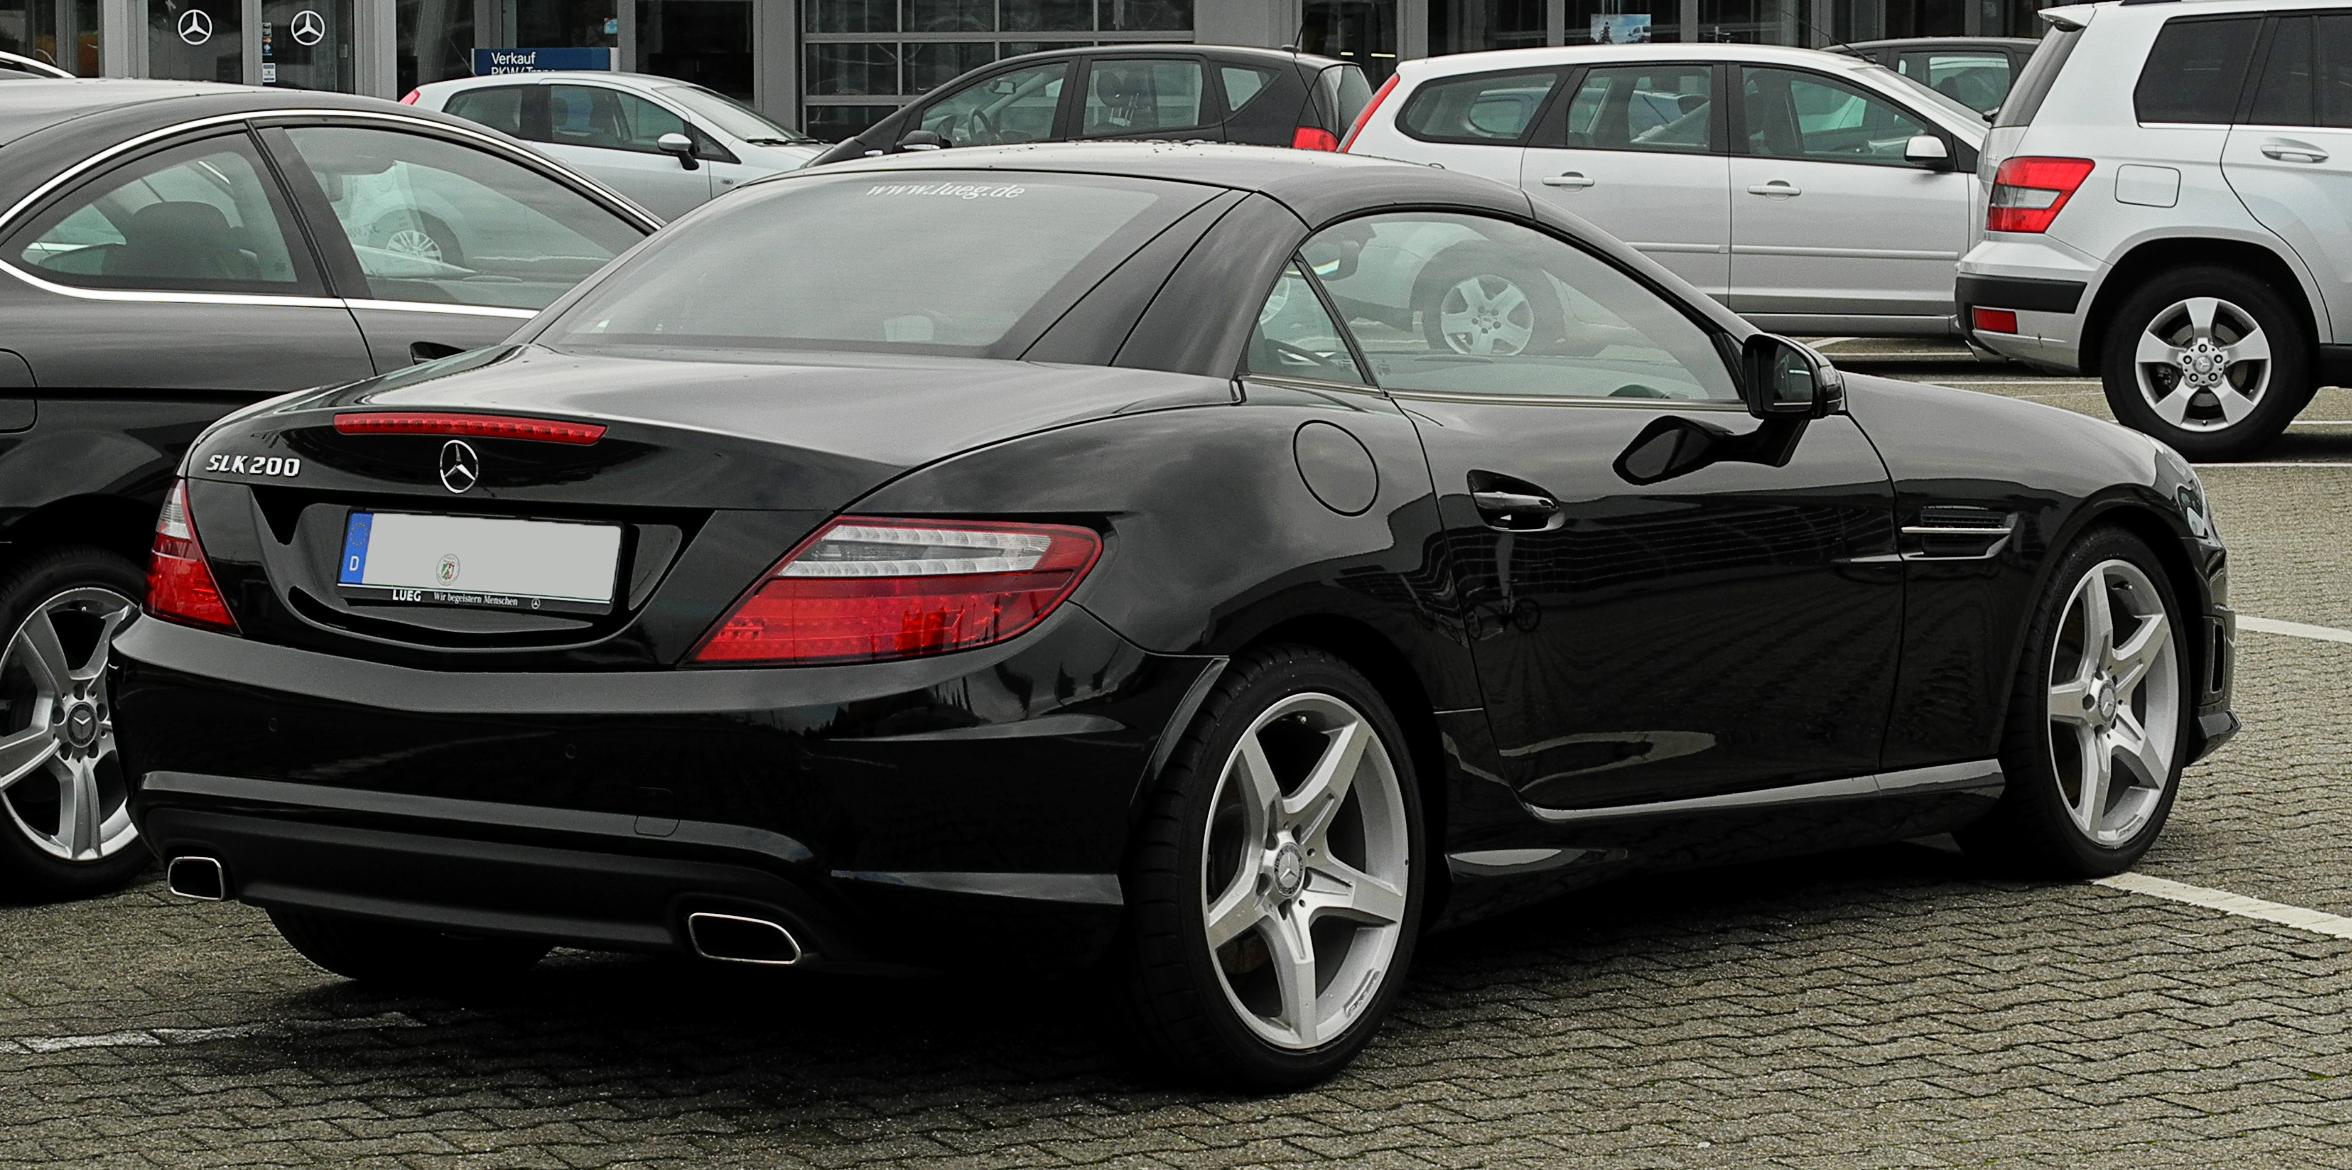 Used 2012 Mercedes-Benz SLK Slk 200 Blueefficiency Amg ...  |Mercedes Slk 200 Amg Sport